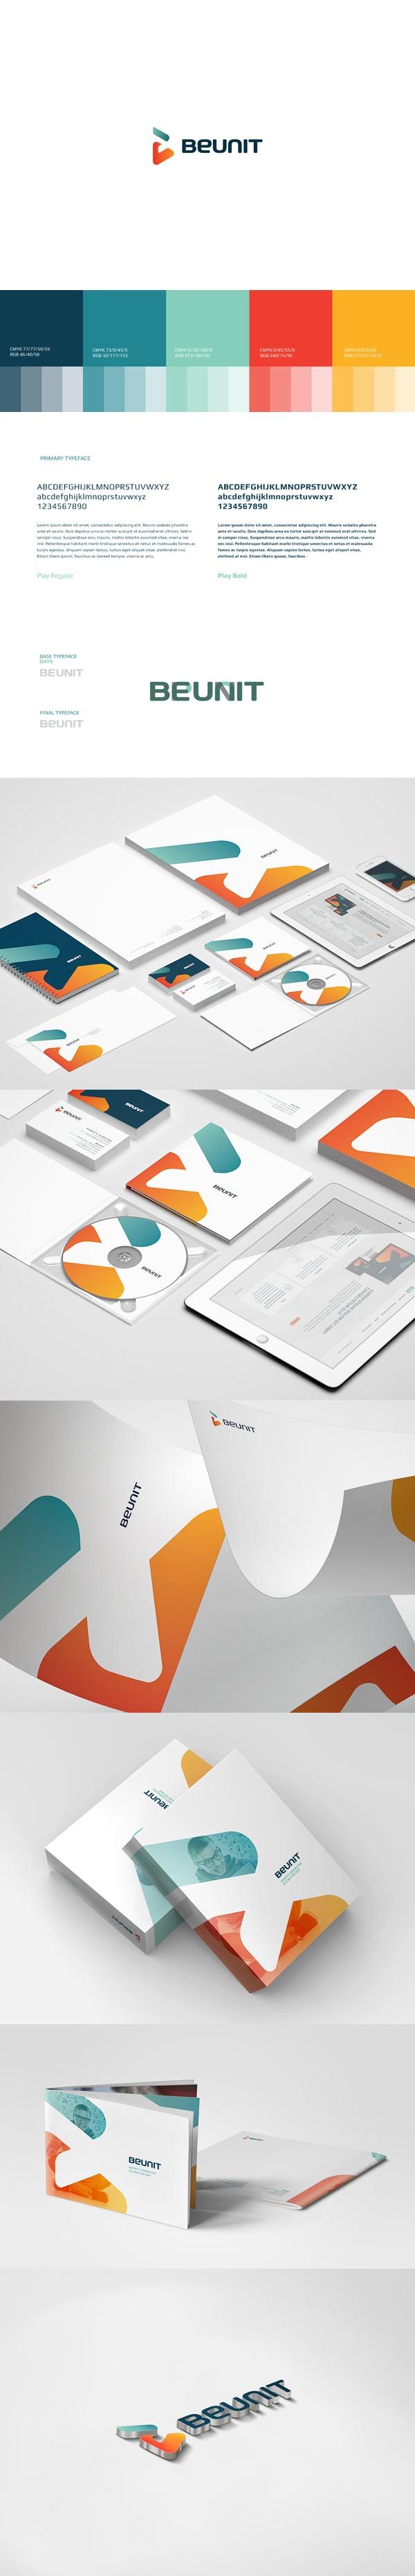 BEUNIT by kreujemy.to , via Behance #design #corporate #identity #branding #visual